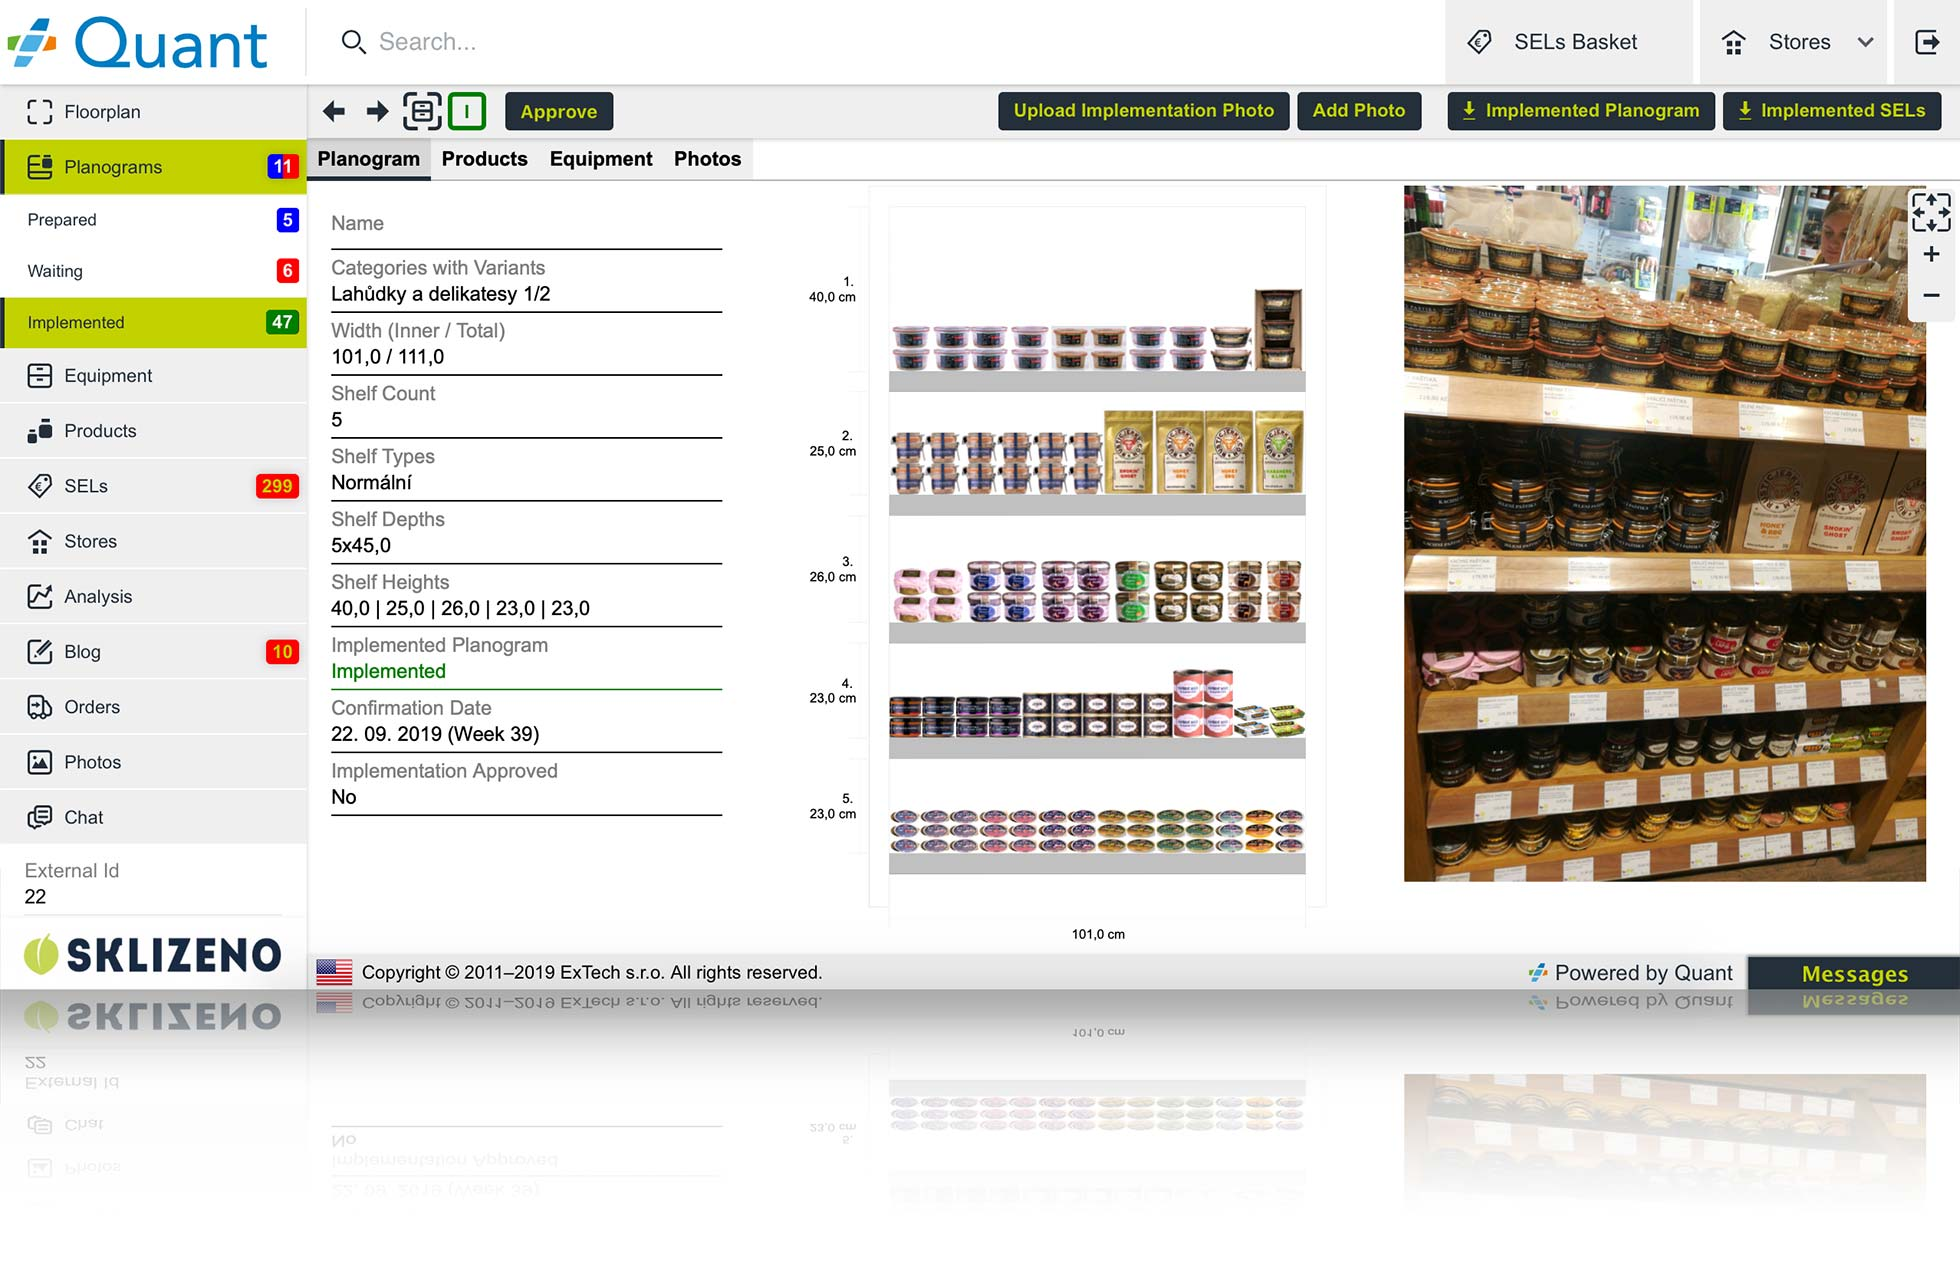 Planogram Compliance Check via Implementation Photo